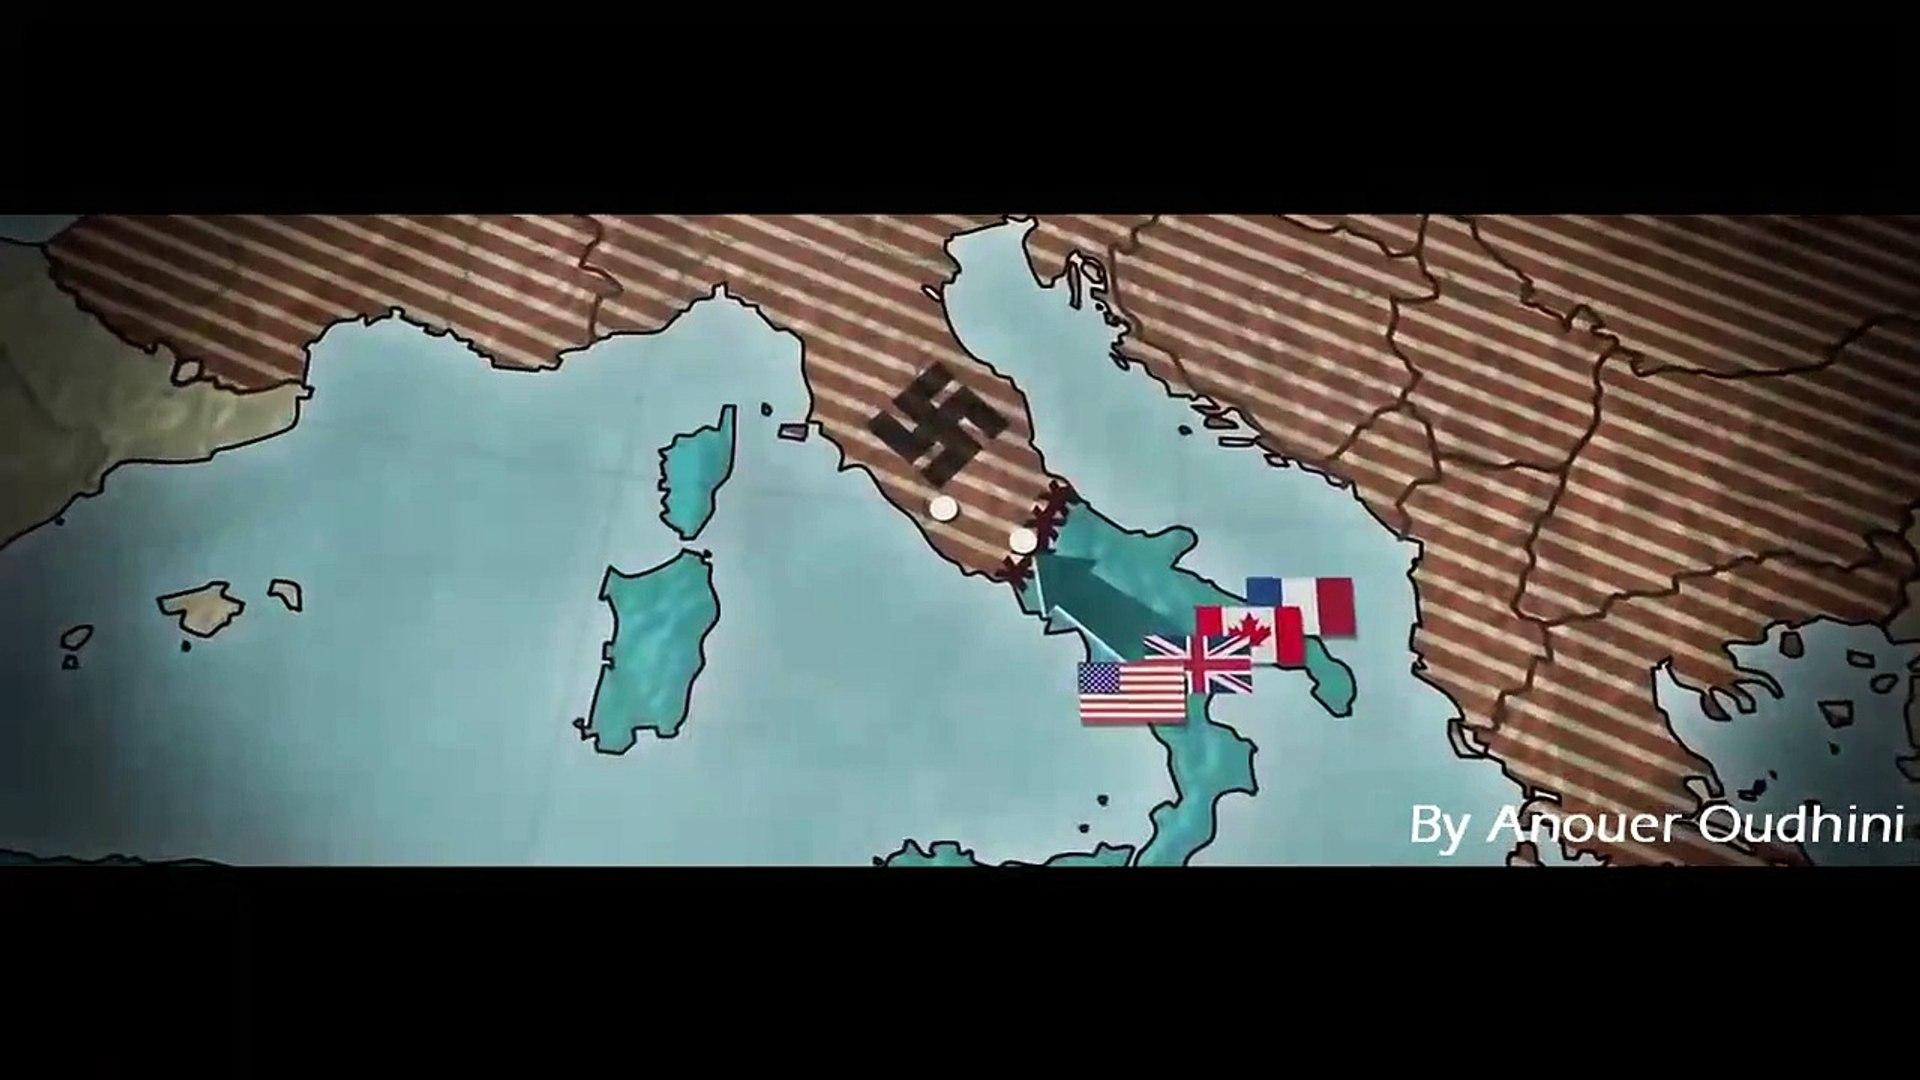 Apocalypse World War 2 [HD] |Episode 6| -ابوكاليبس الحرب العالمية الثانية جودة عالية - الحلقة -6